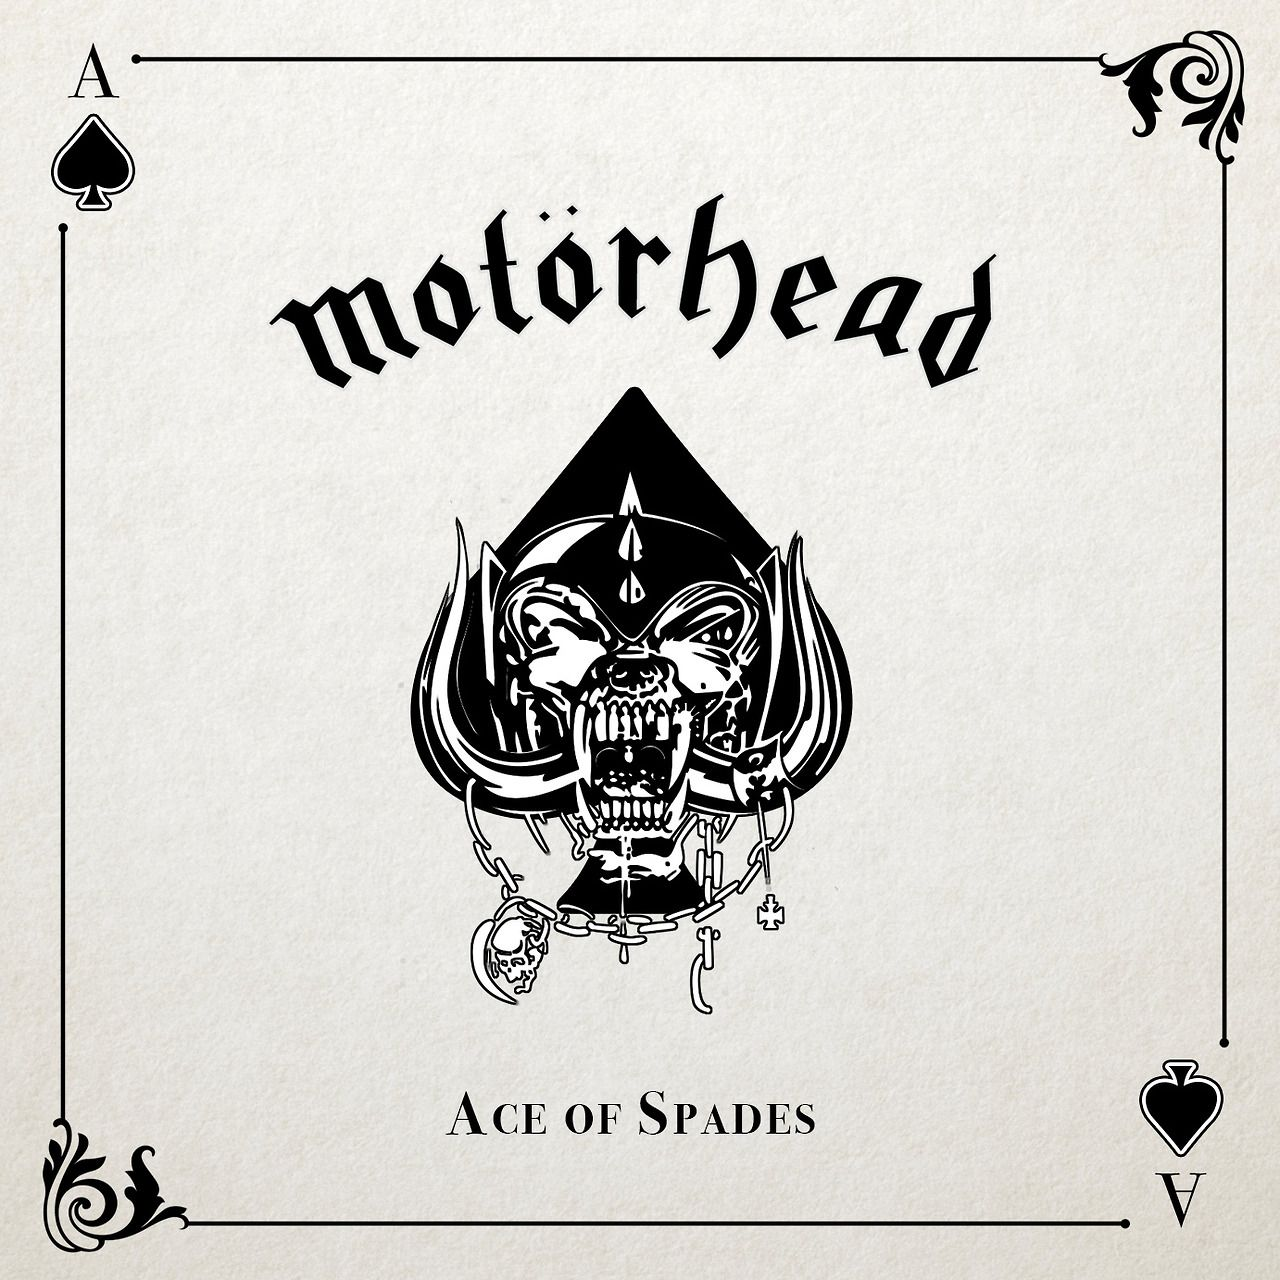 Motorhead - Ace of Spades My favorite Motorhead album  This